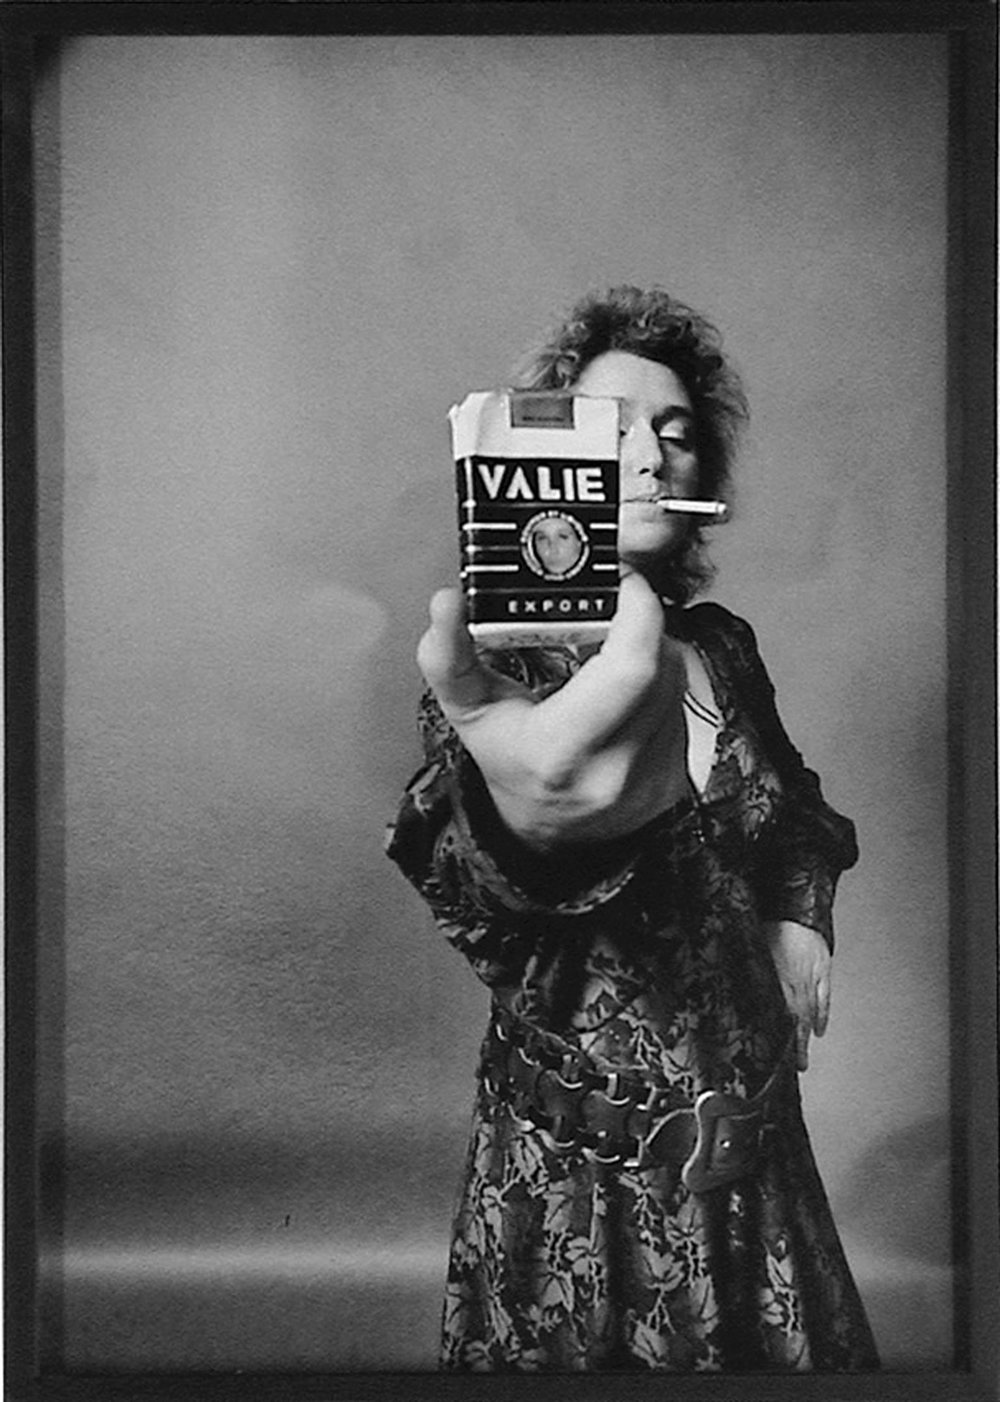 L'artista austriaca VALIE EXPORT in una significativa immagine